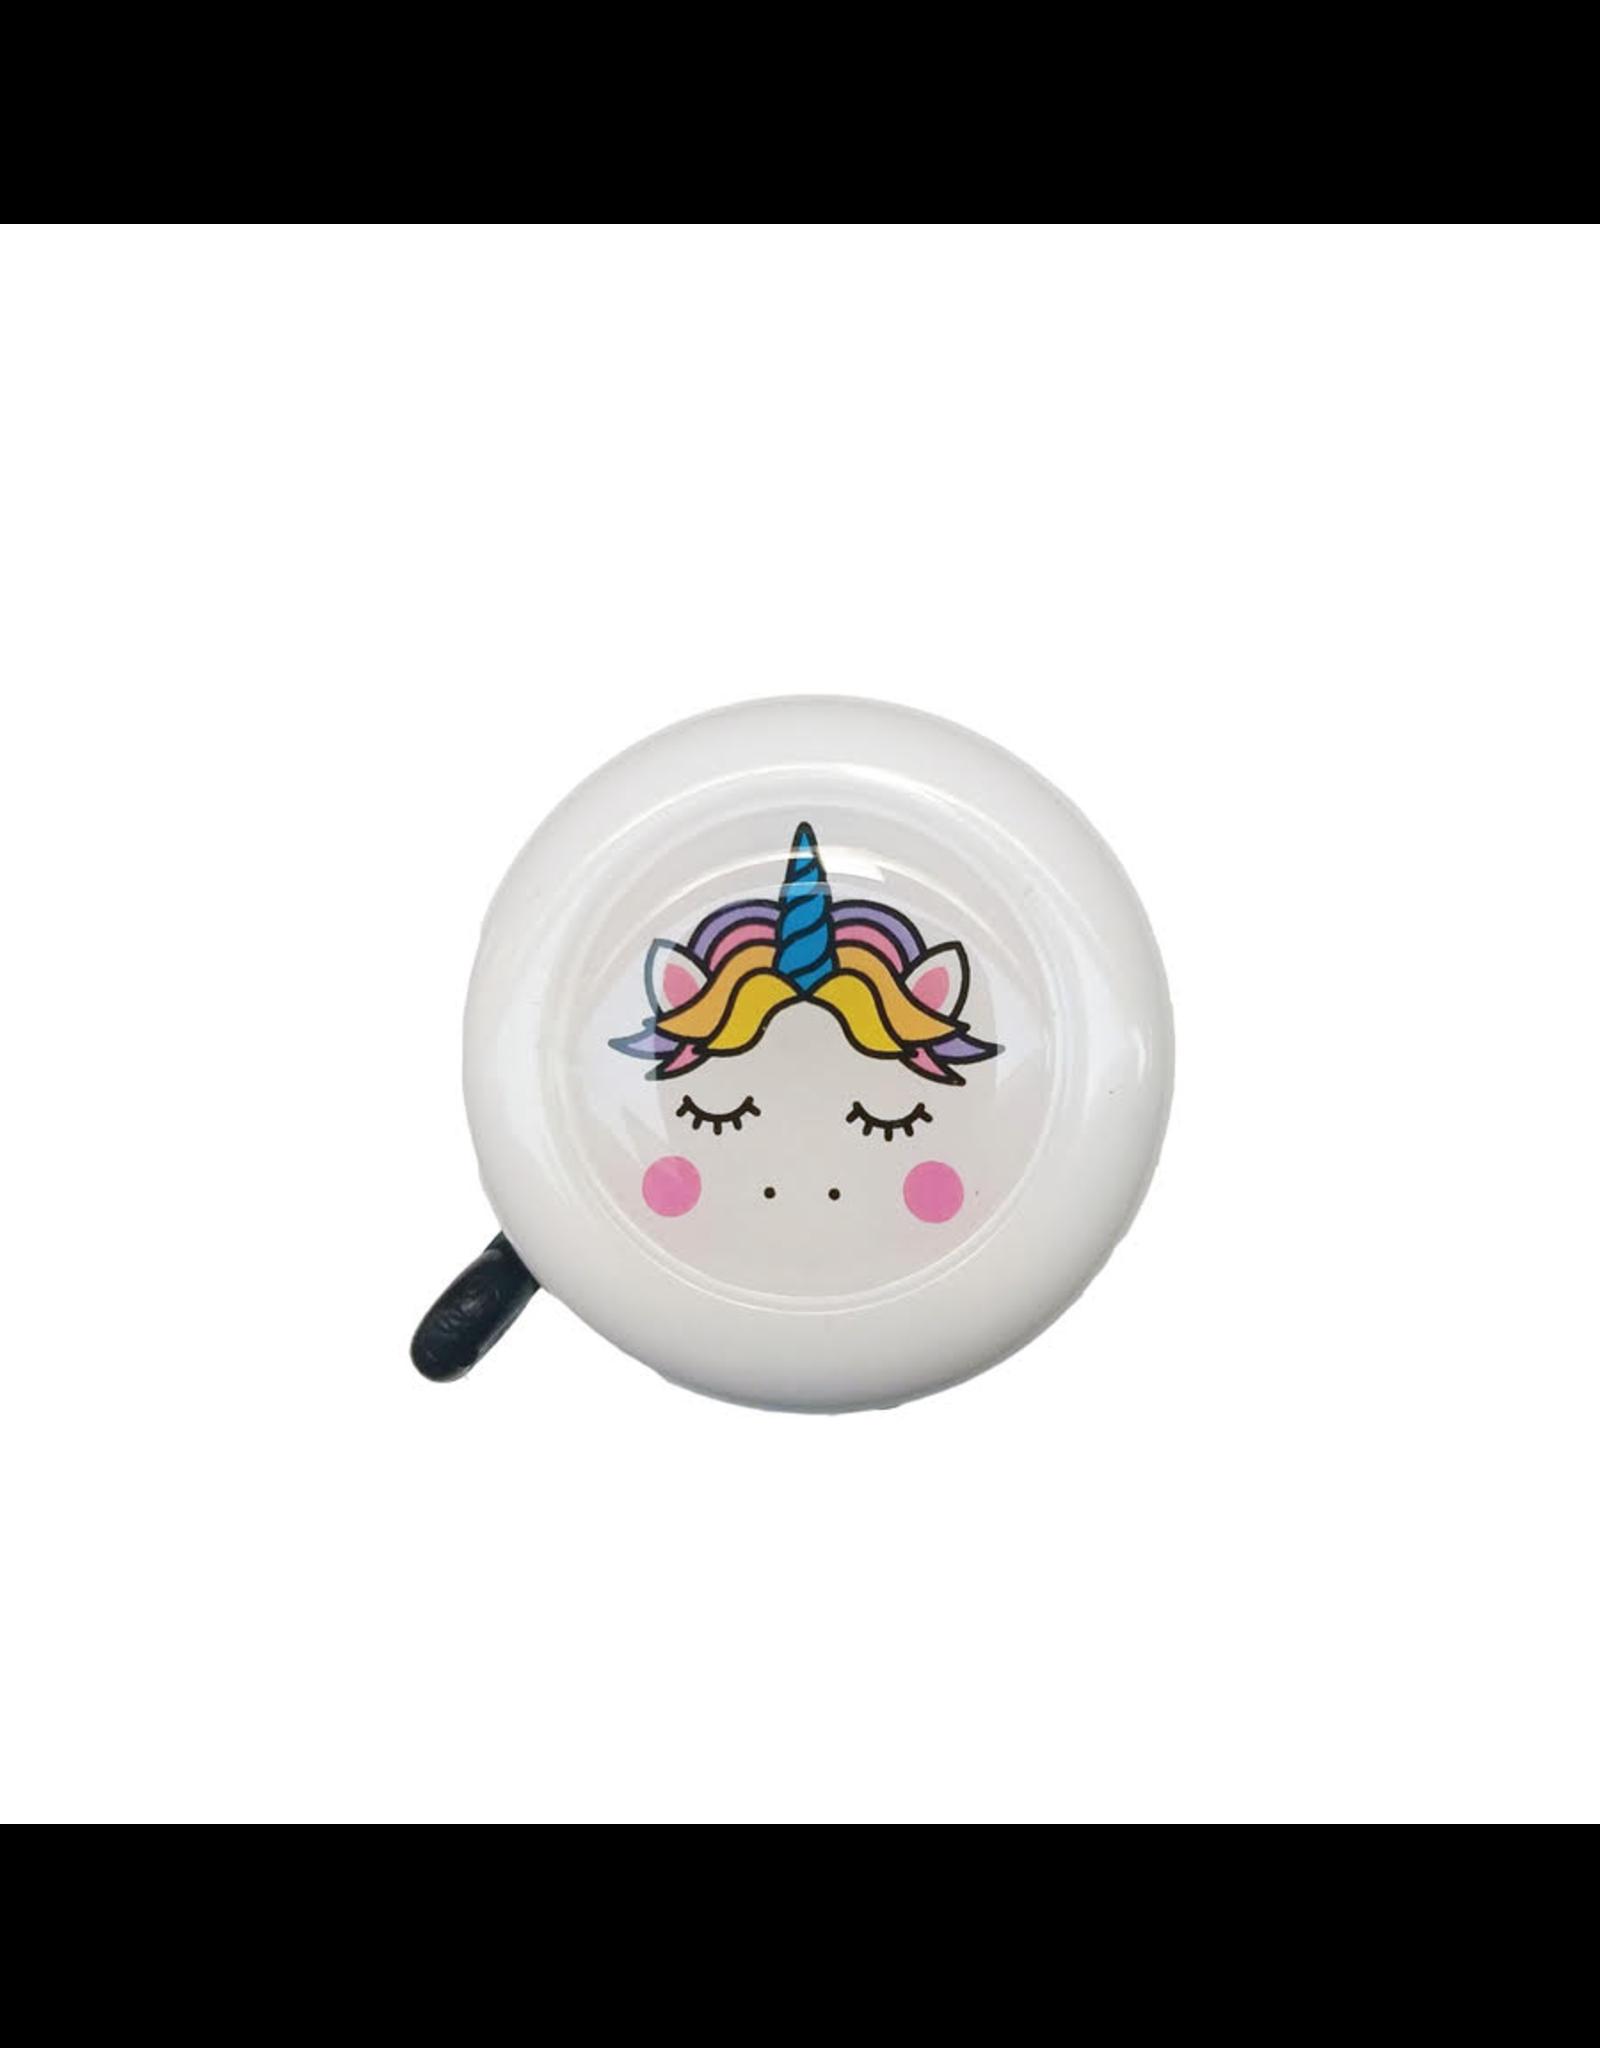 Cruiser Candy Unicorn Cruiser Candy Bell